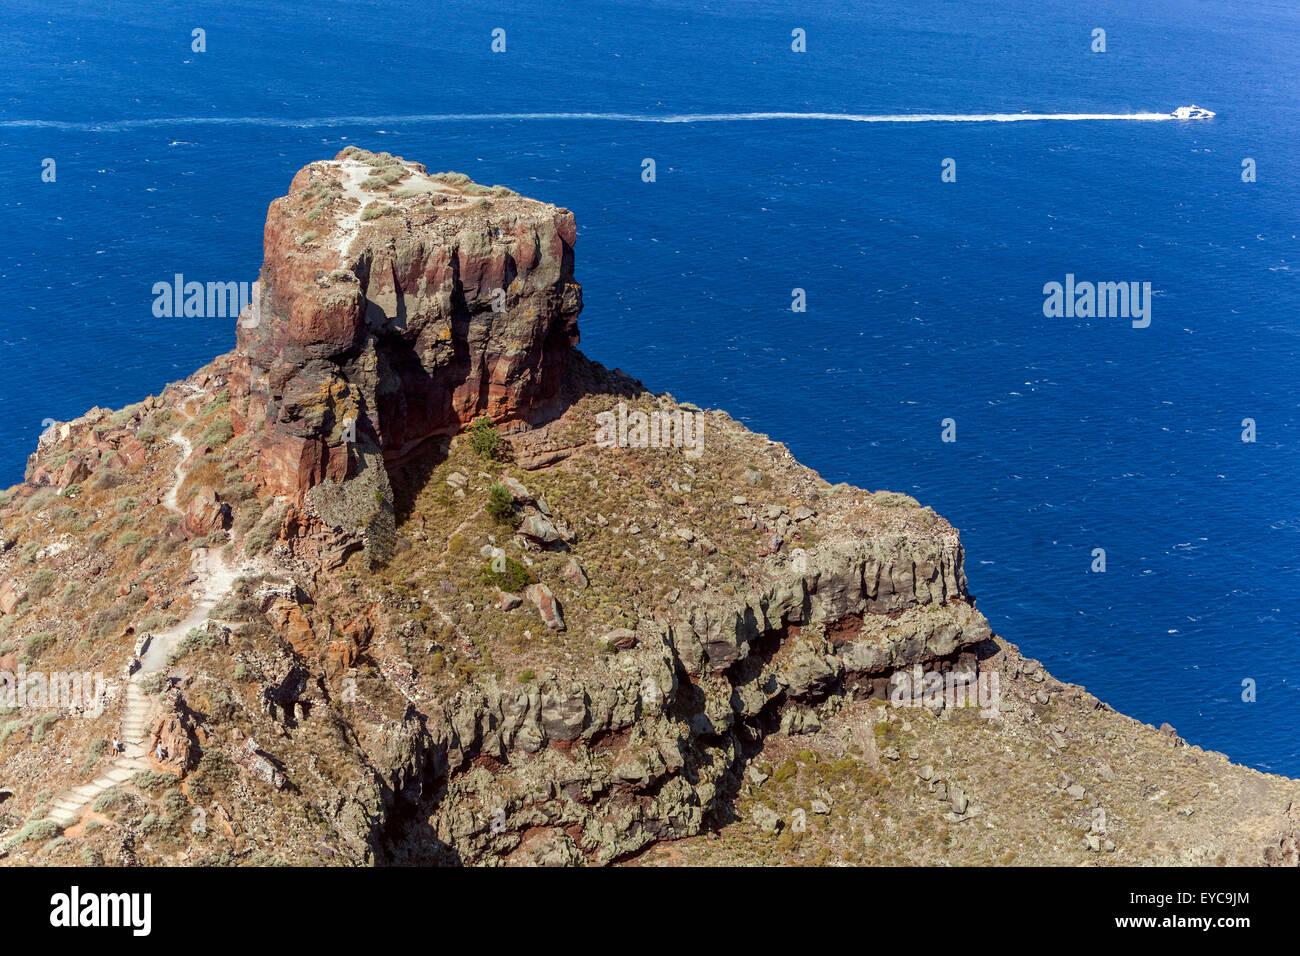 The volcanic rock of Skaros Imerovigli Santorini Cyclades Greece - Stock Image